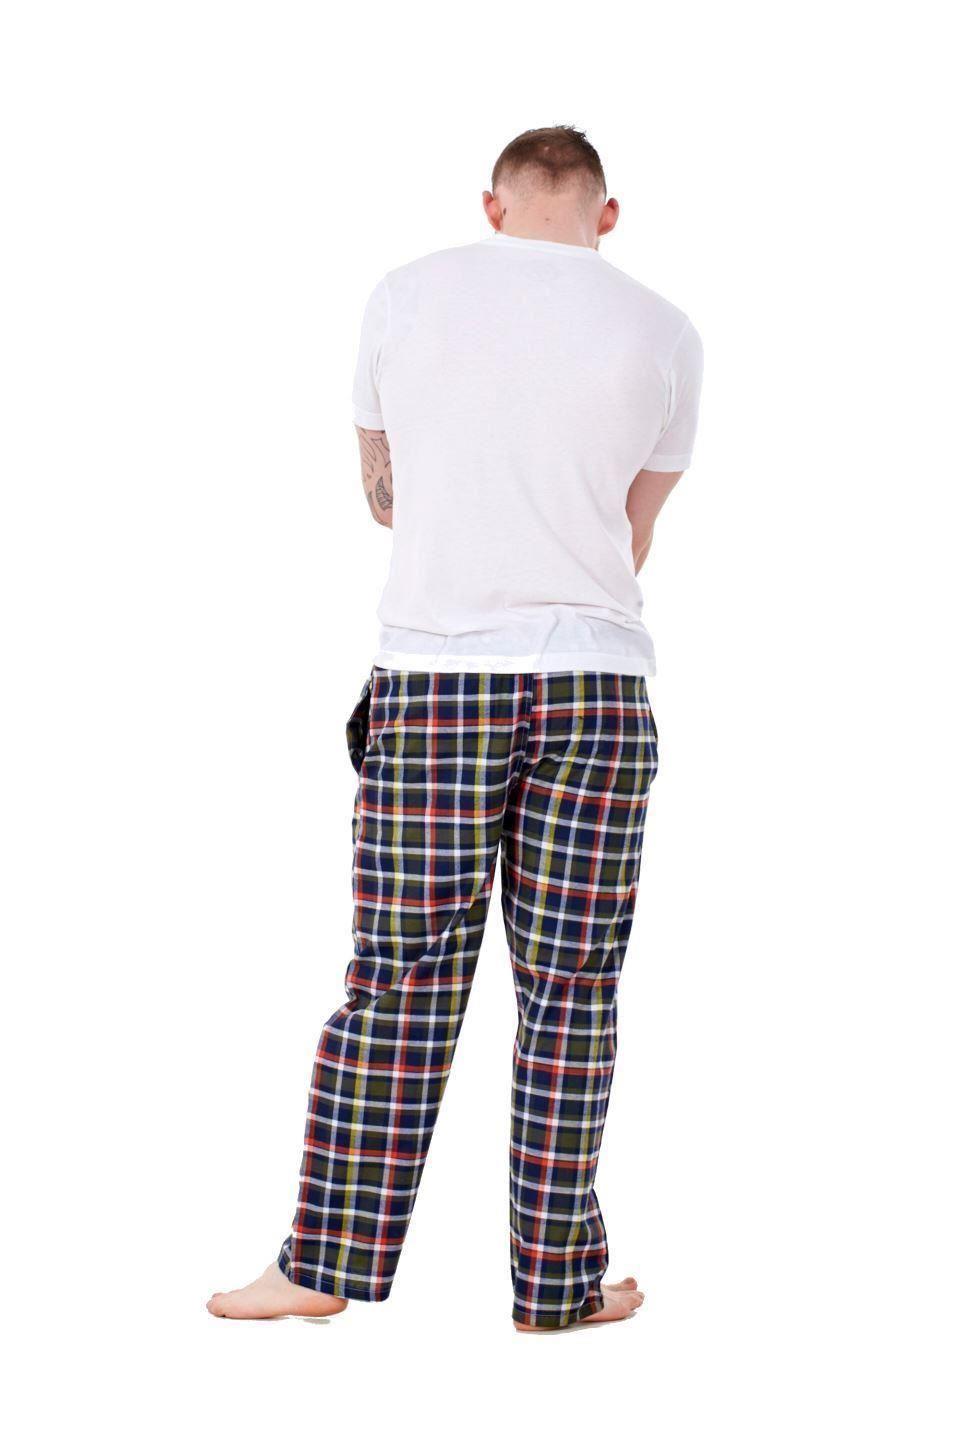 Mens-Pyjama-Bottoms-Rich-Cotton-Woven-Check-Lounge-Pant-Nightwear-Big-3XL-to-5XL Indexbild 36